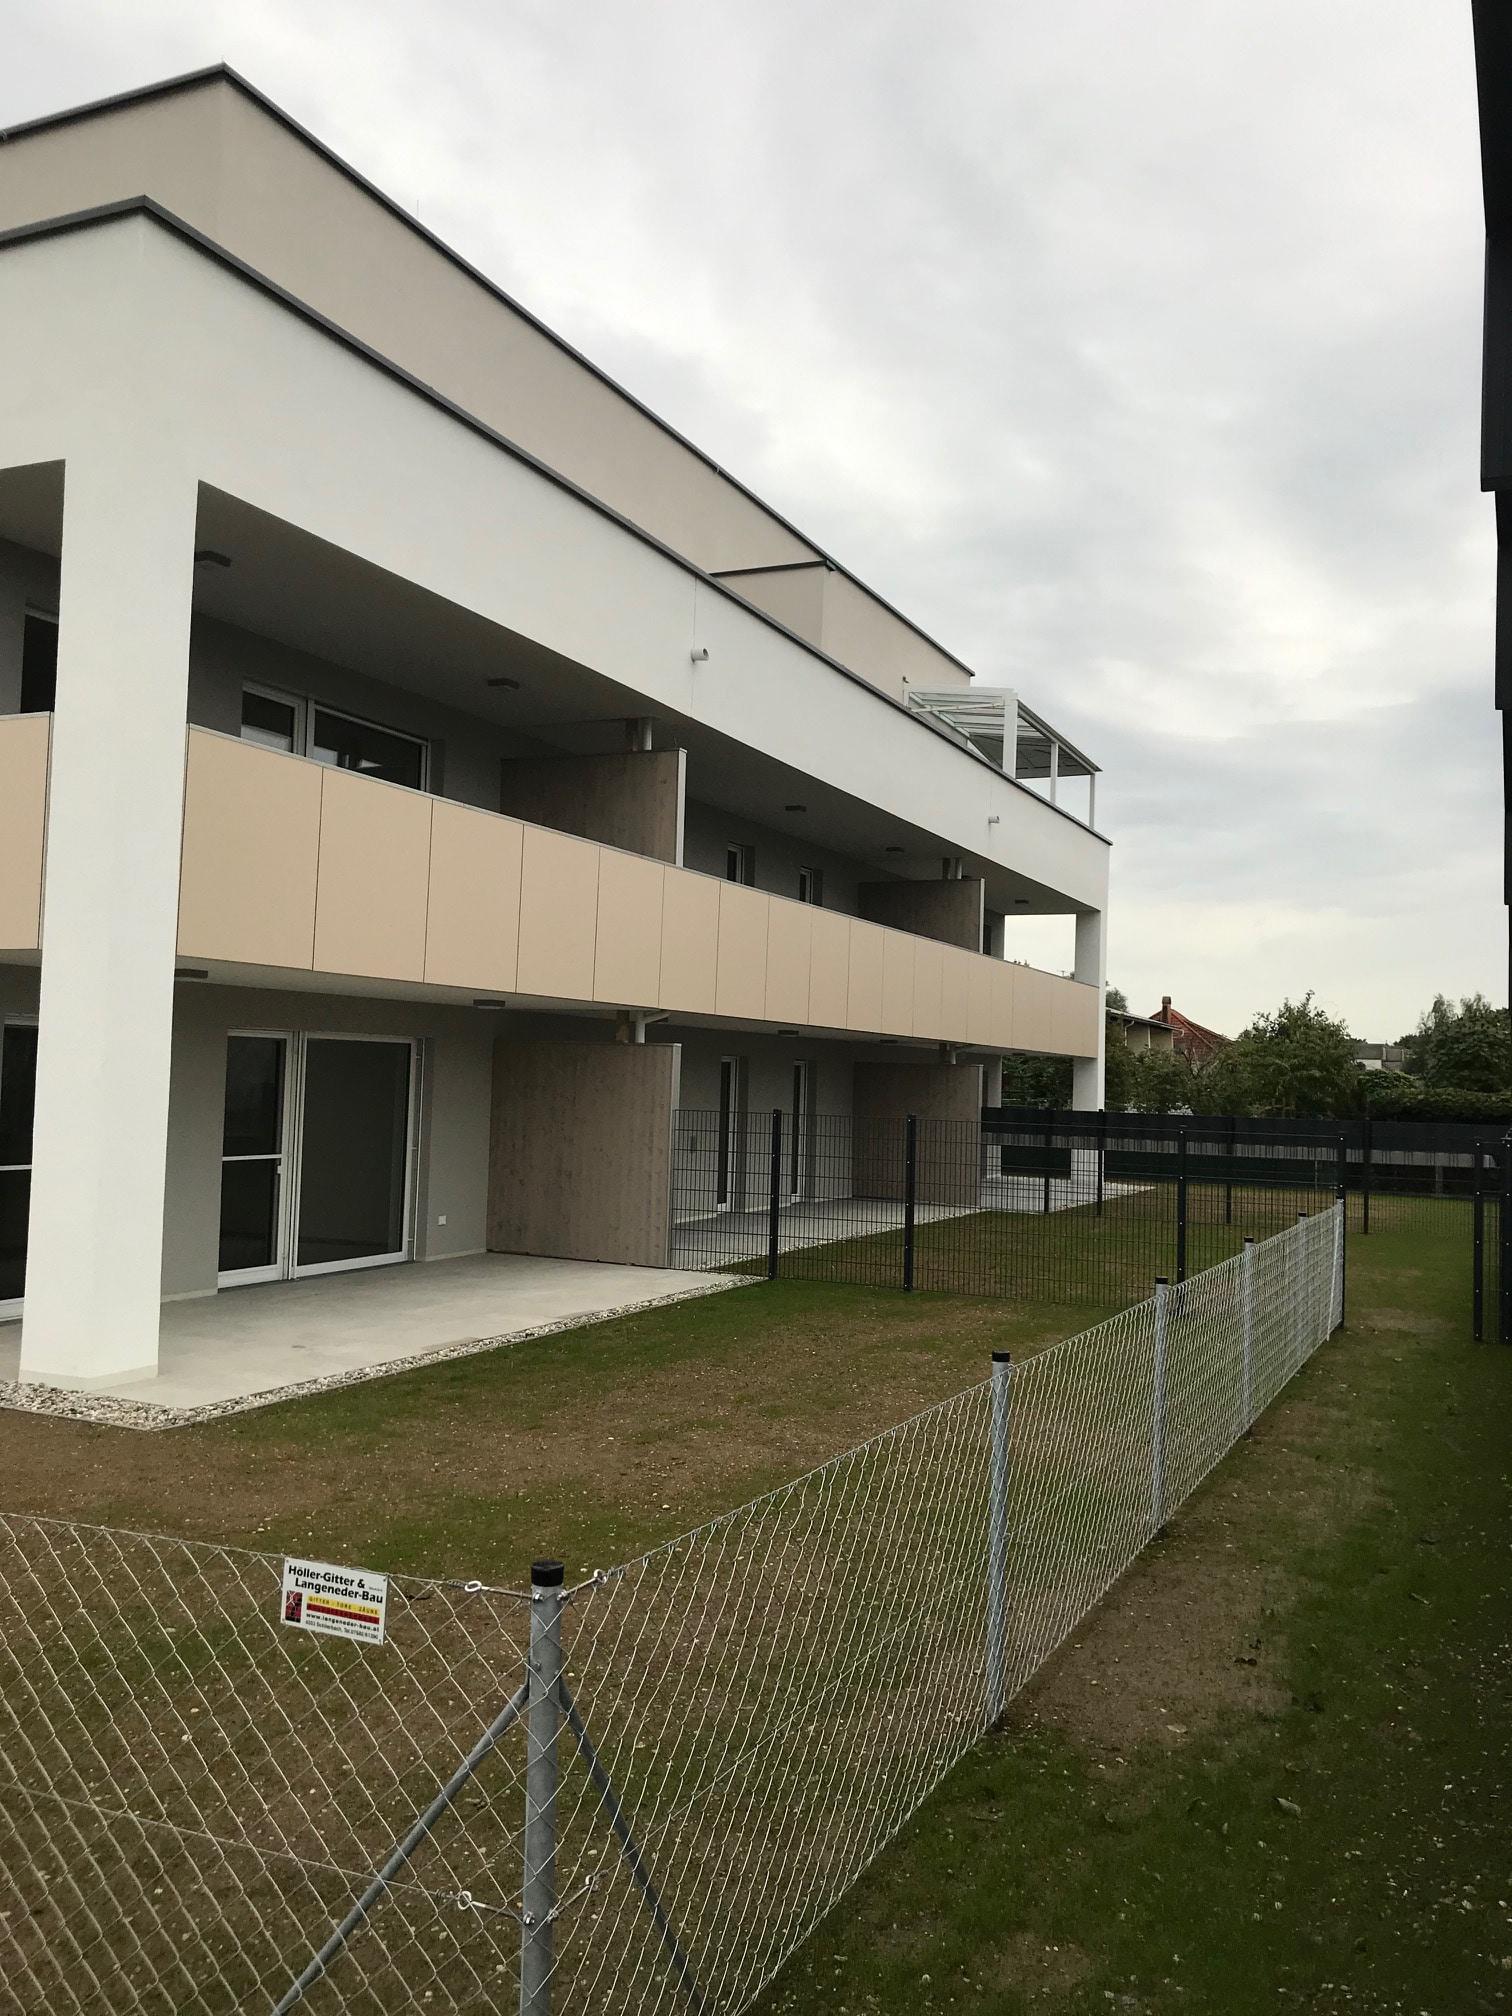 Dachgeschosswohnung - Terrassenüberdachung in Pichling OÖ